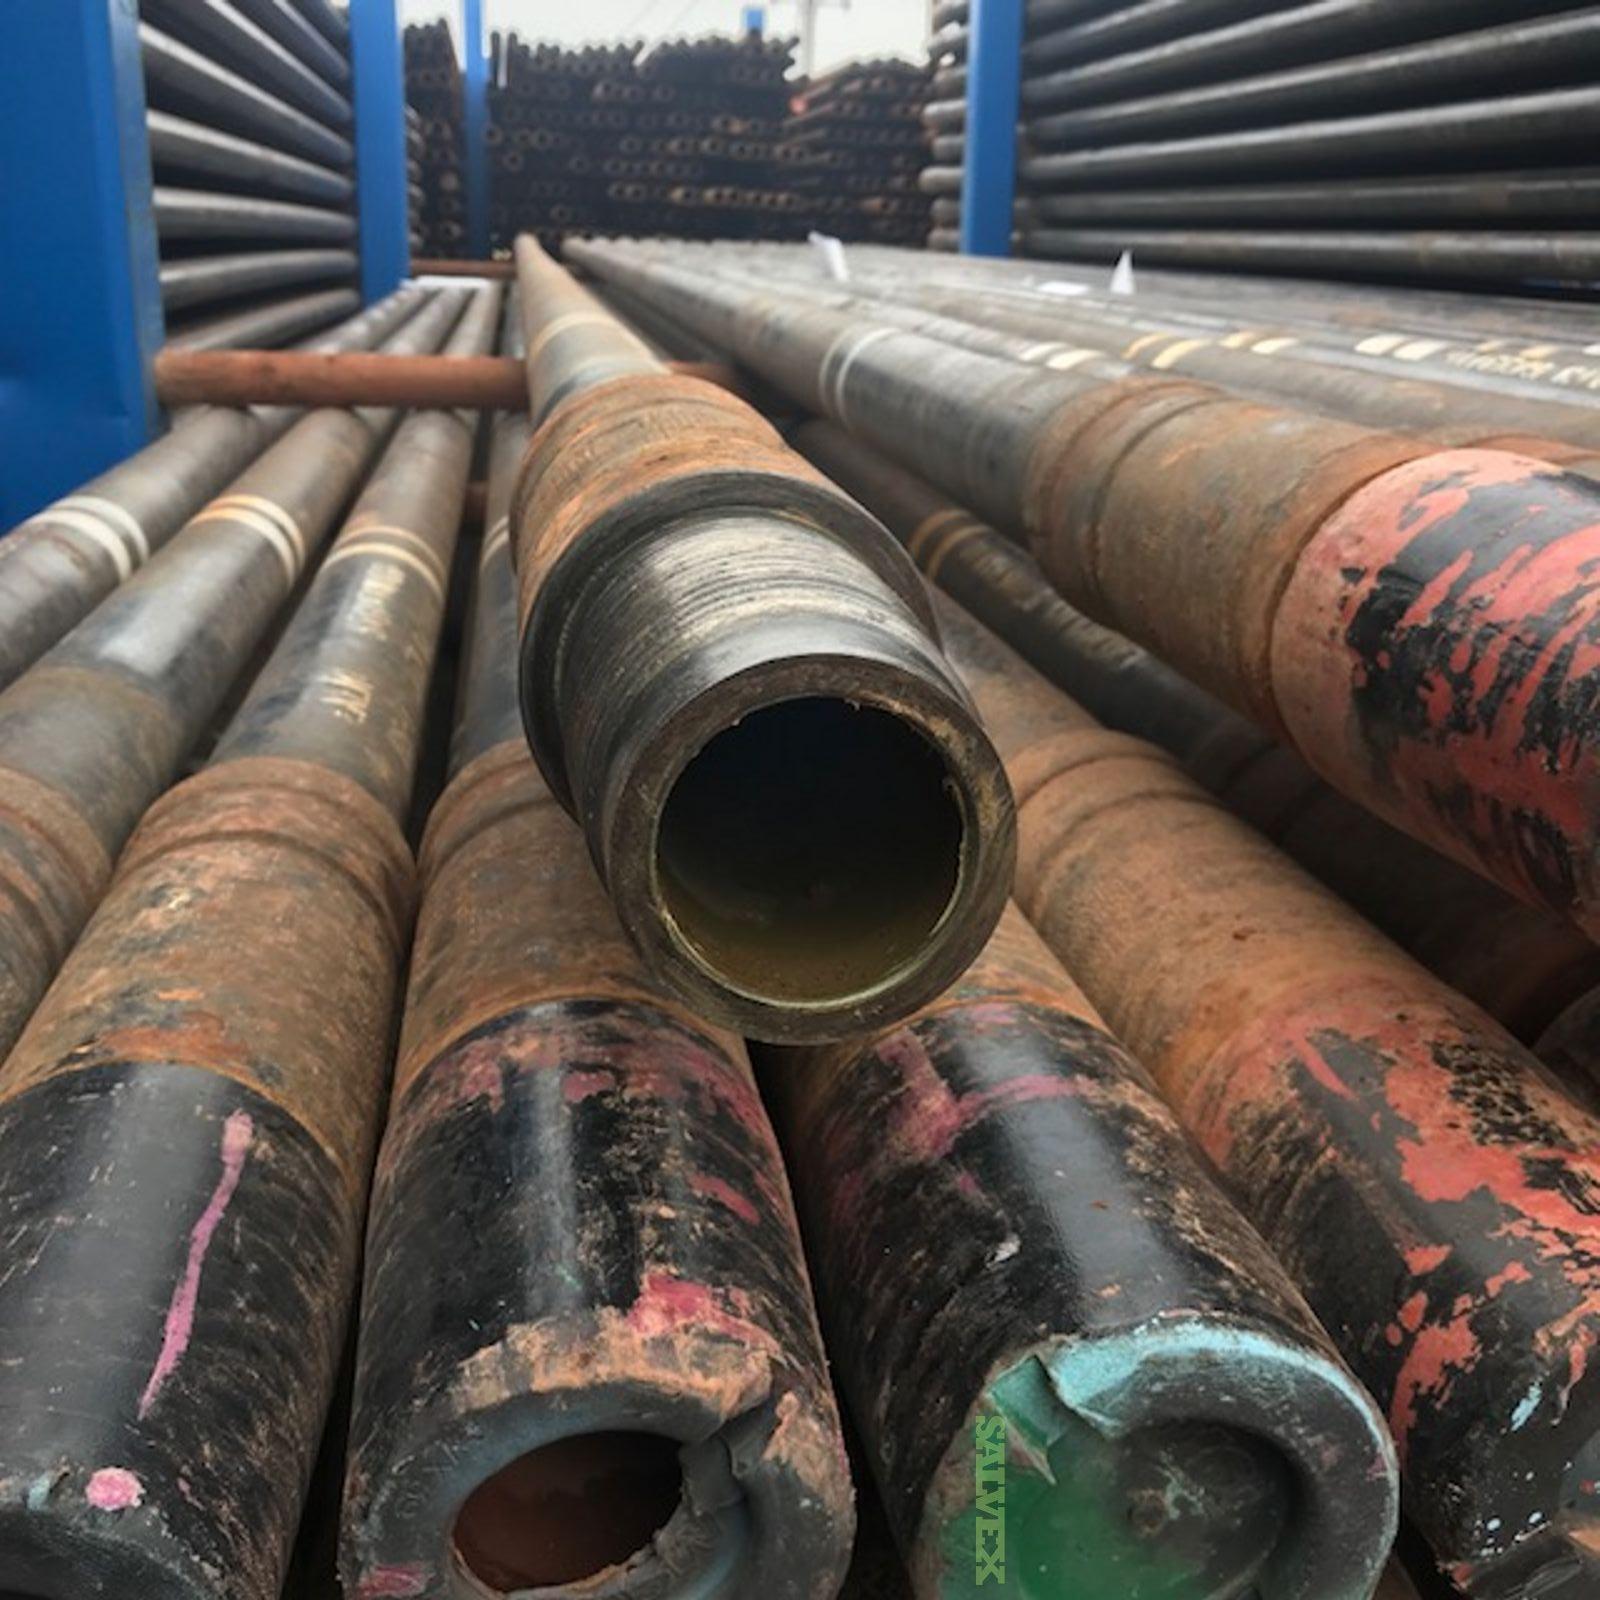 4 14# S-135 VX-39 Premium Drill Pipe ( Feet 10,800 / 61 Metric Tons)